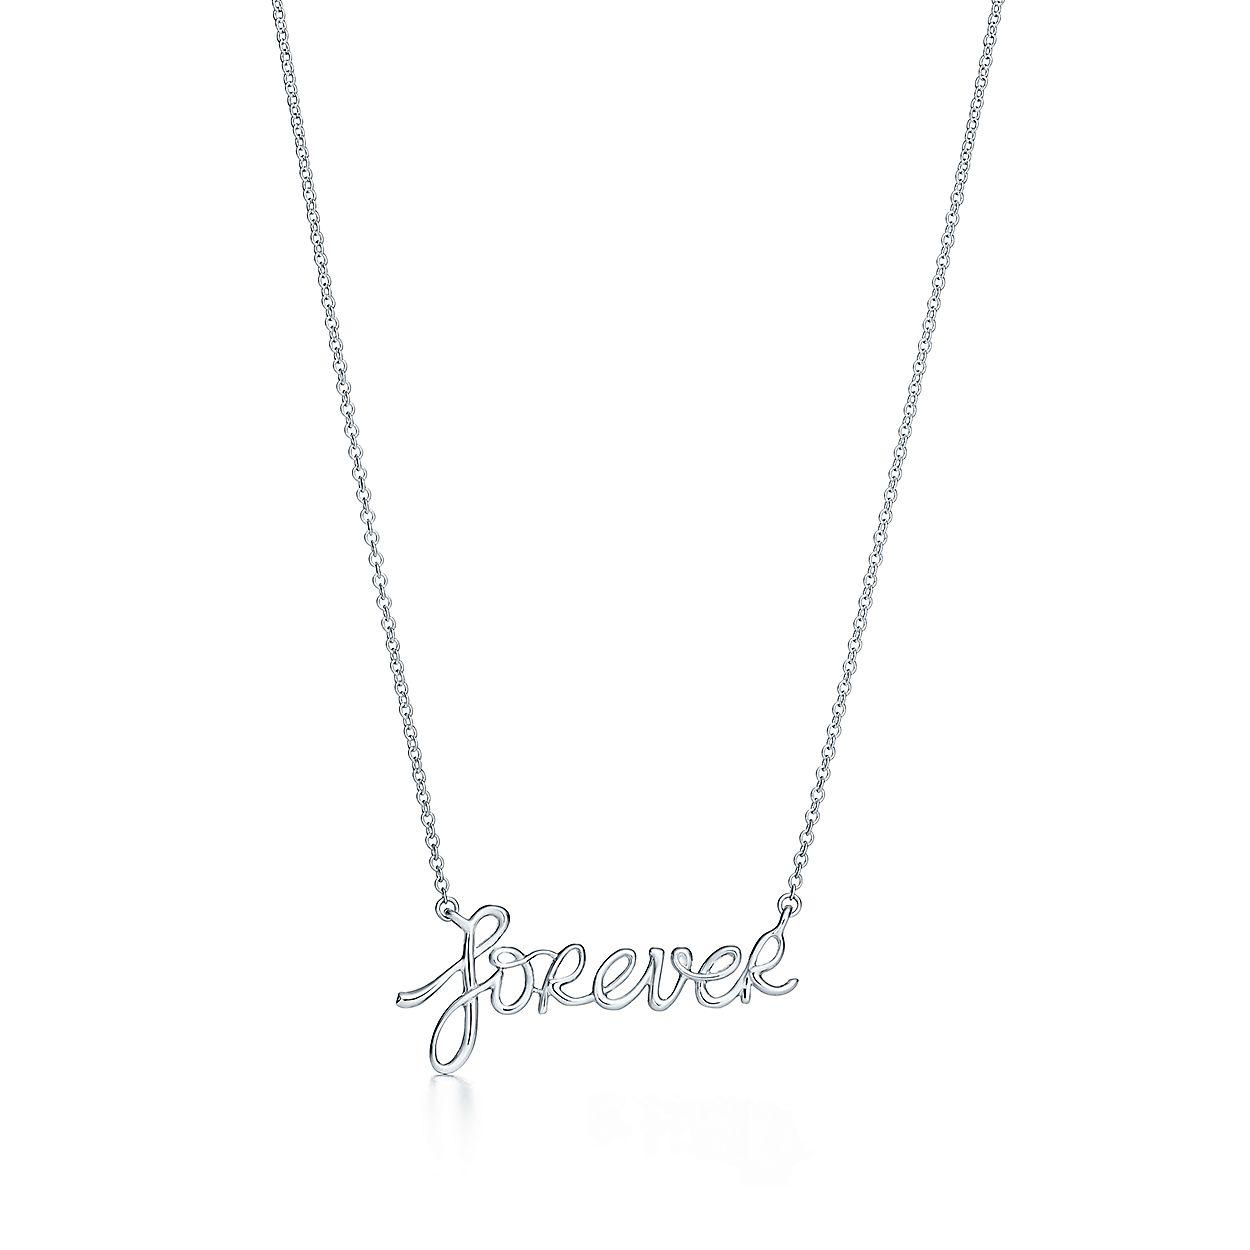 2edbcd889 Paloma's Graffiti forever pendant in sterling silver. | Tiffany & Co.